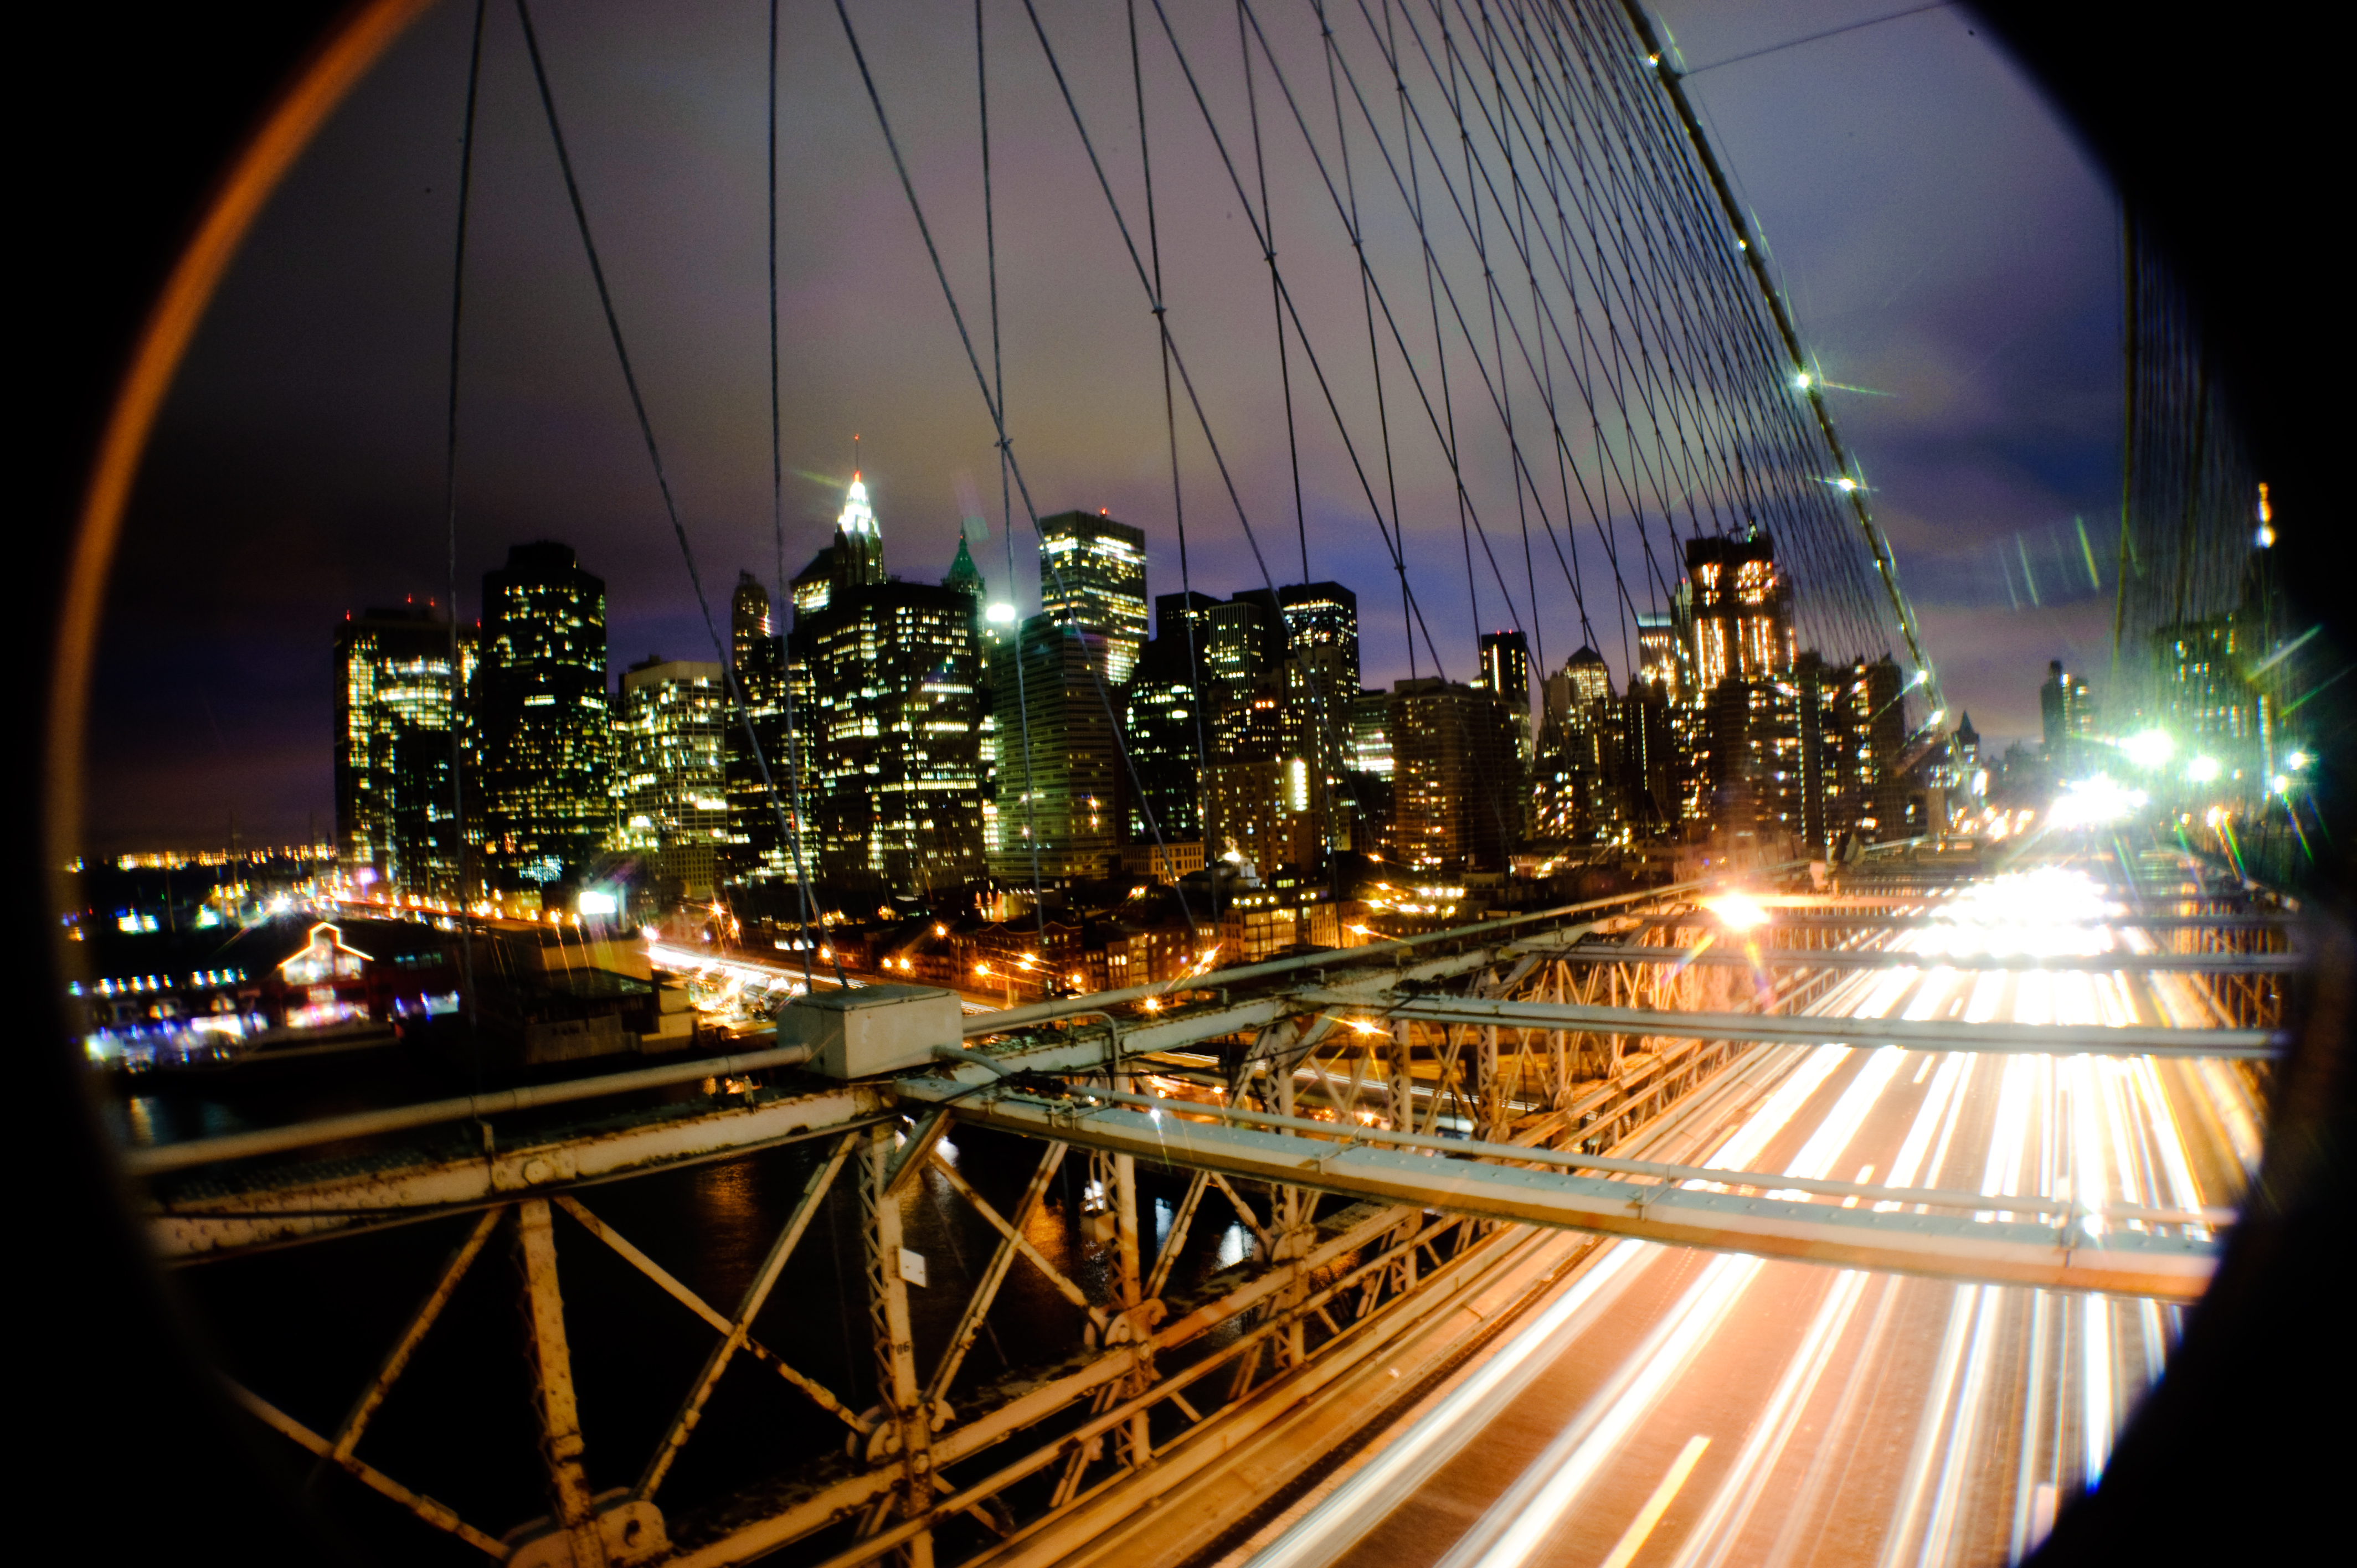 Description new york buildings seen from brooklyn bridge at night